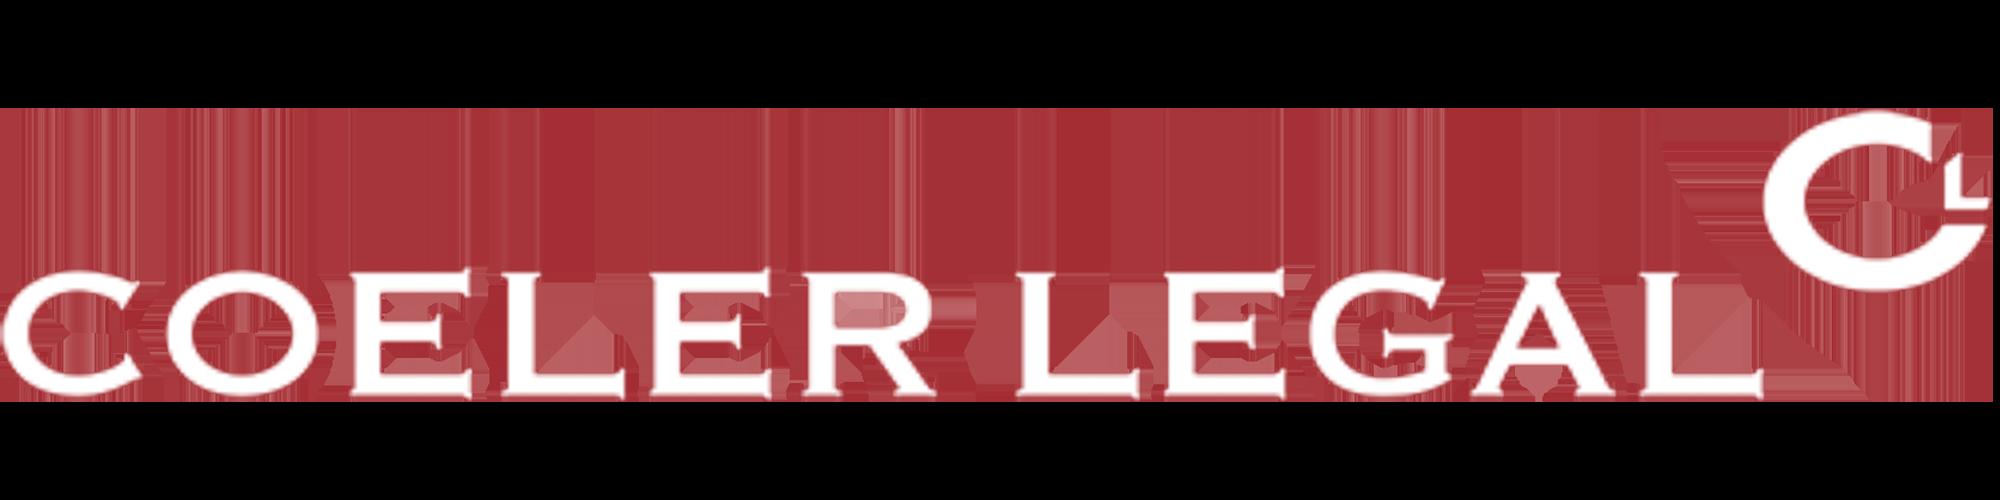 Coeler Legal Logo pxMedia Webdesign Webgestaltung